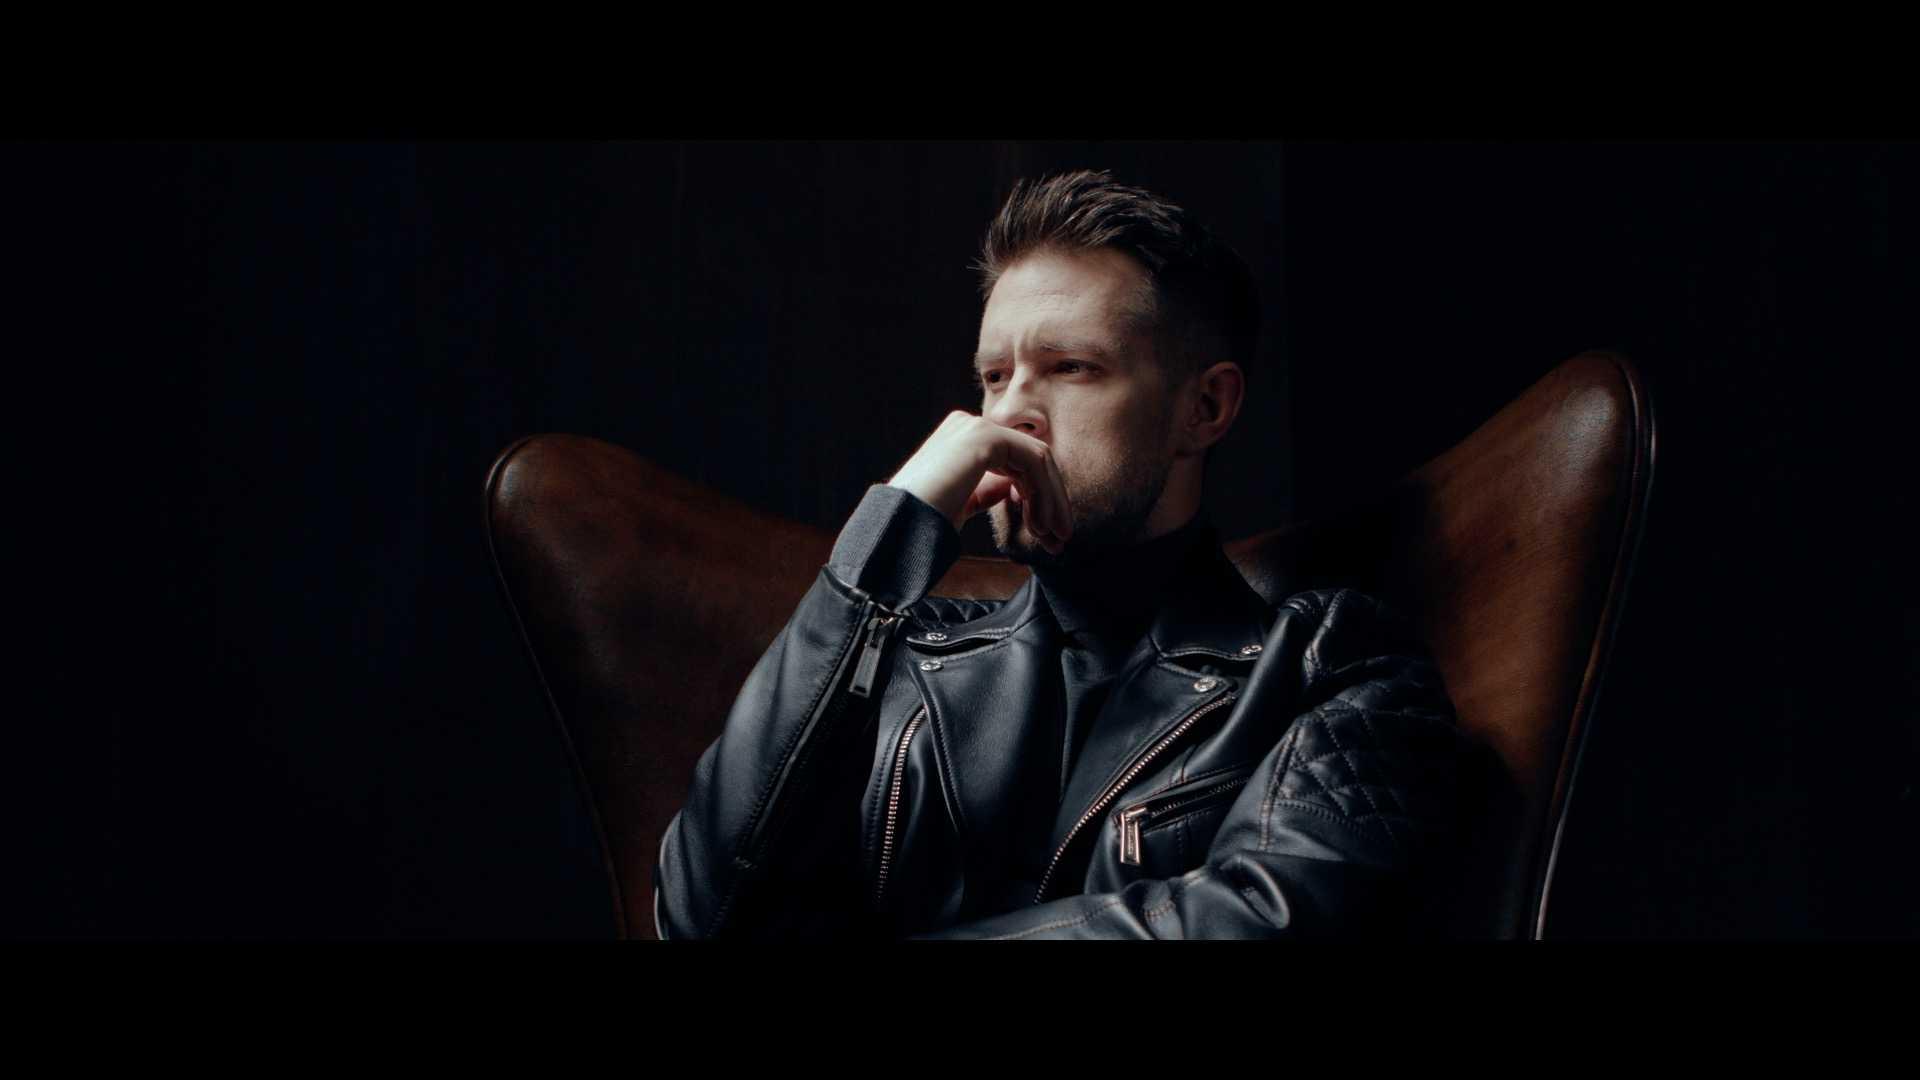 Латвийский певец Маркус Рива